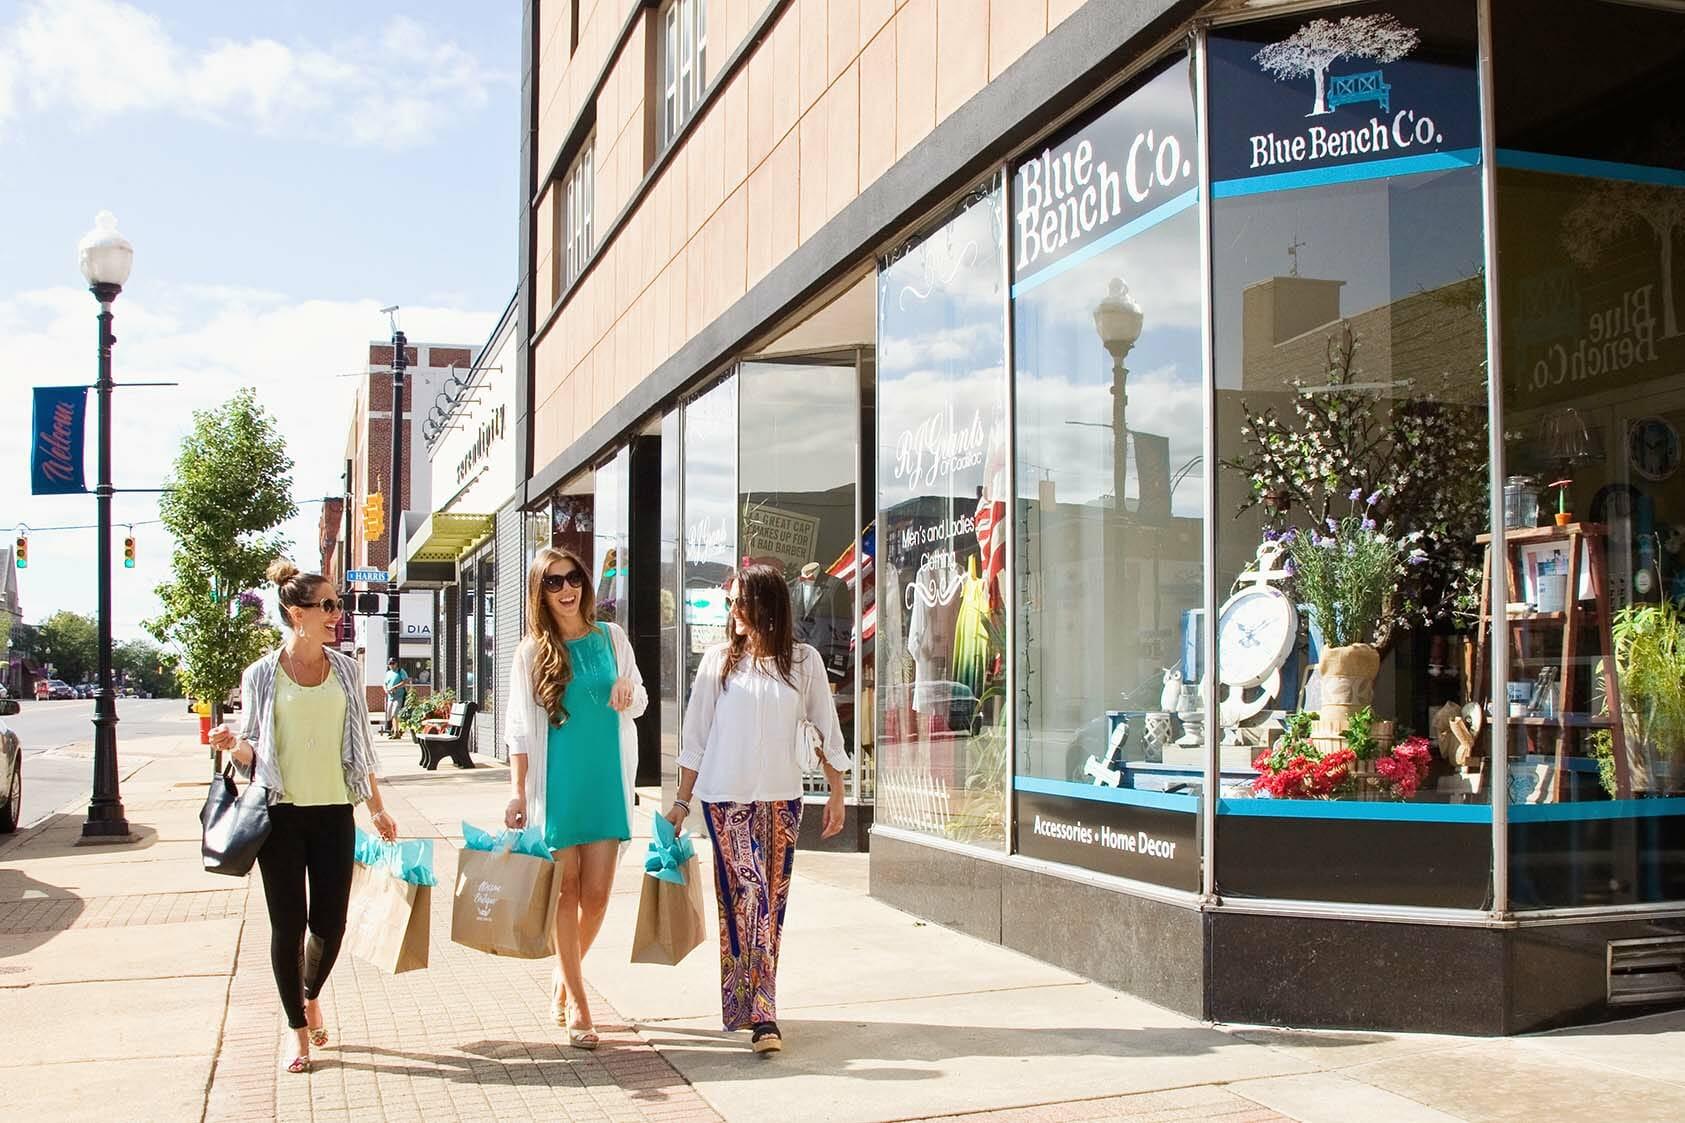 3 women with shopping bags, shopping in downtown Cadillac Michigan